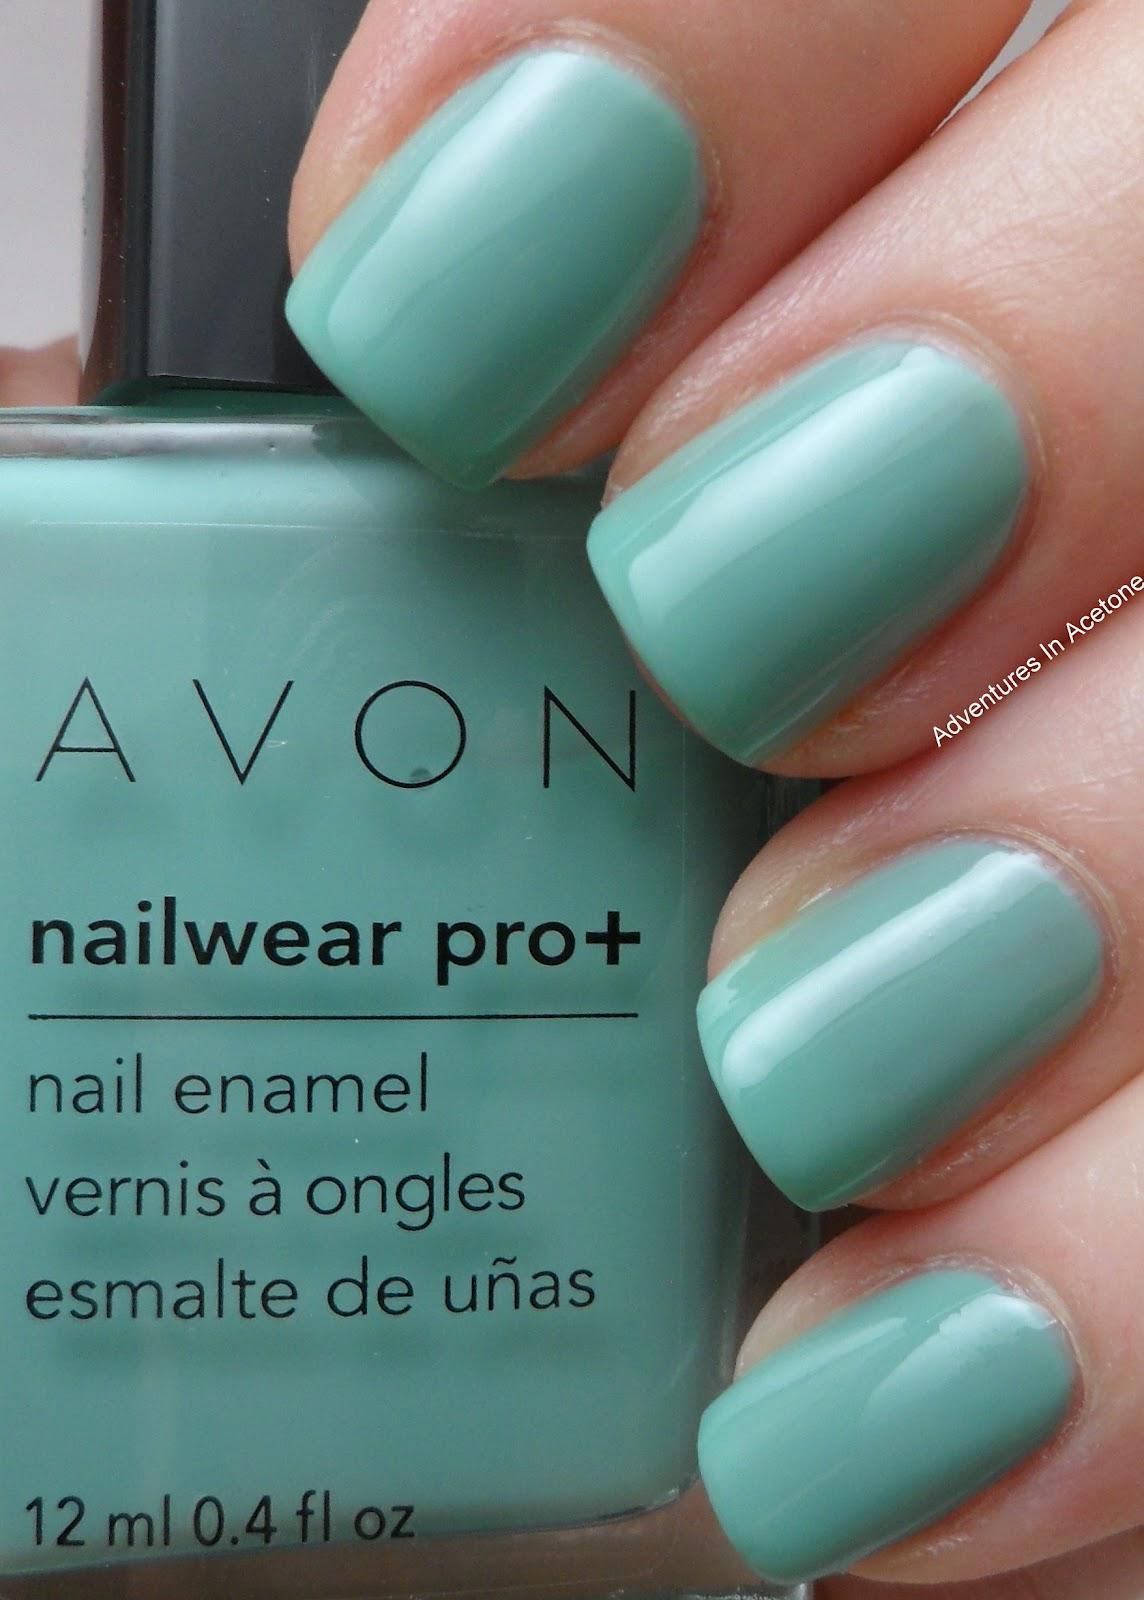 Creme Grant Using Avon Nailwear Pro